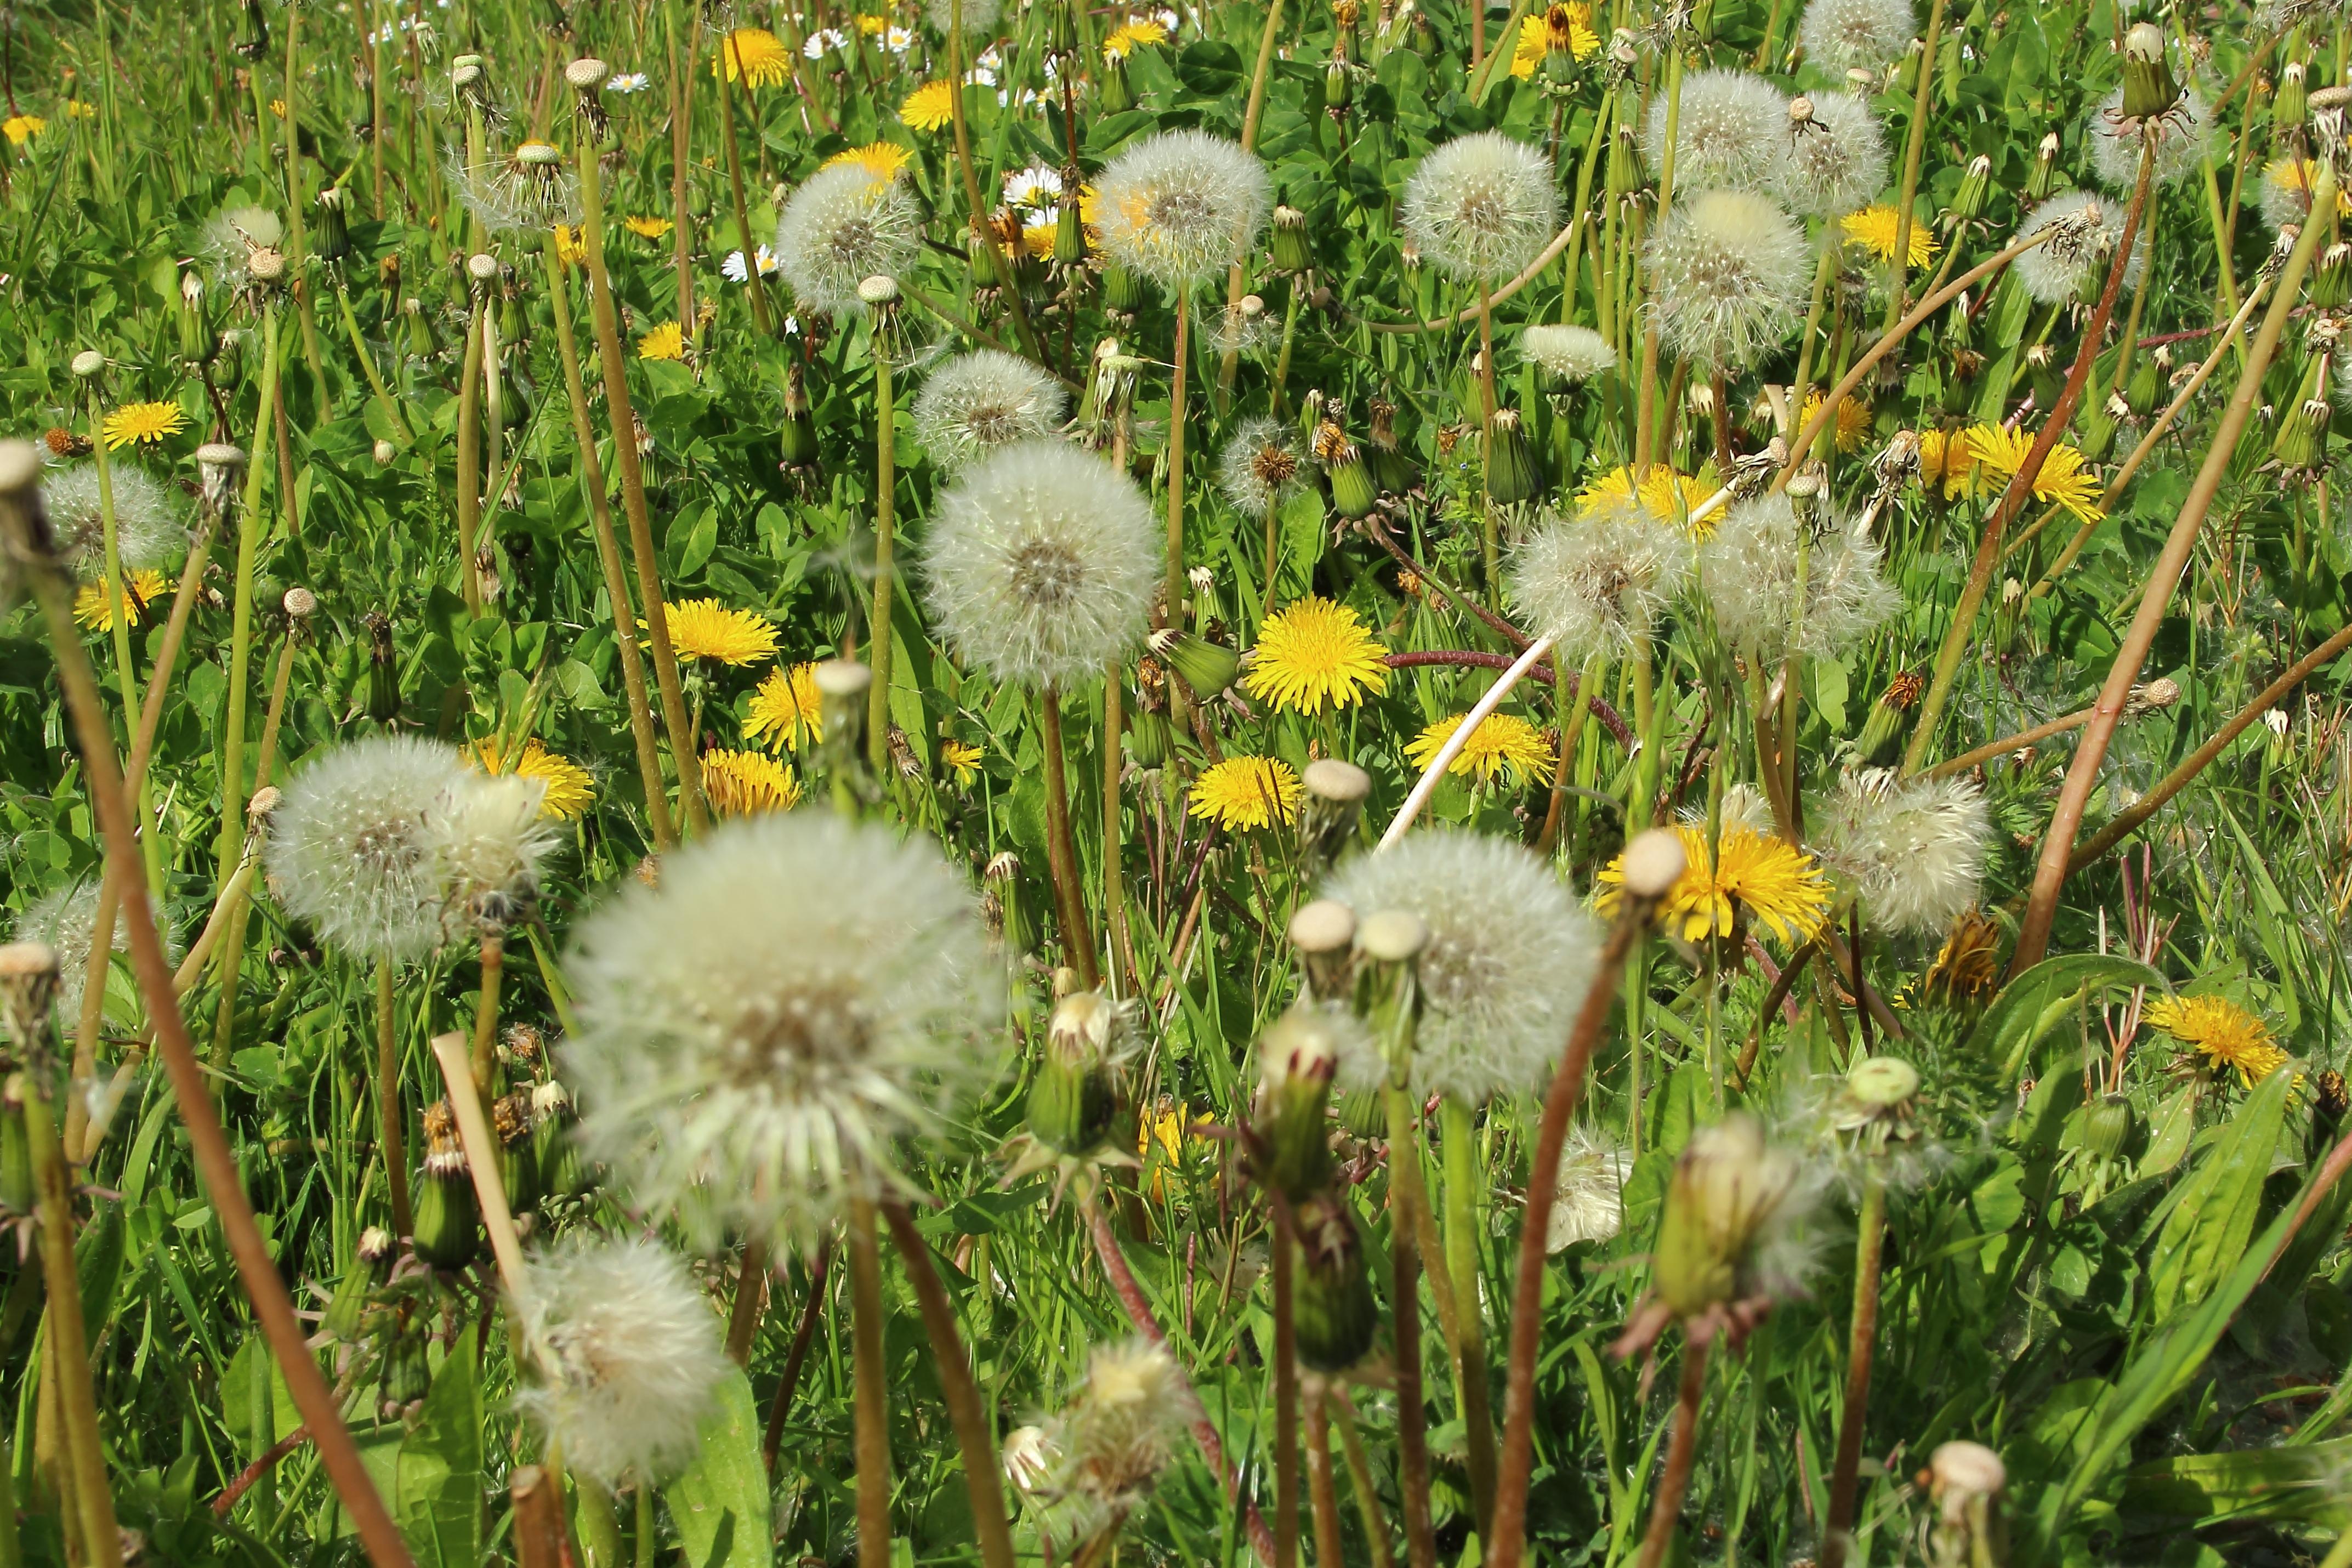 Immagini Belle : natura, dente di leone, prateria, fiore, allergia ...